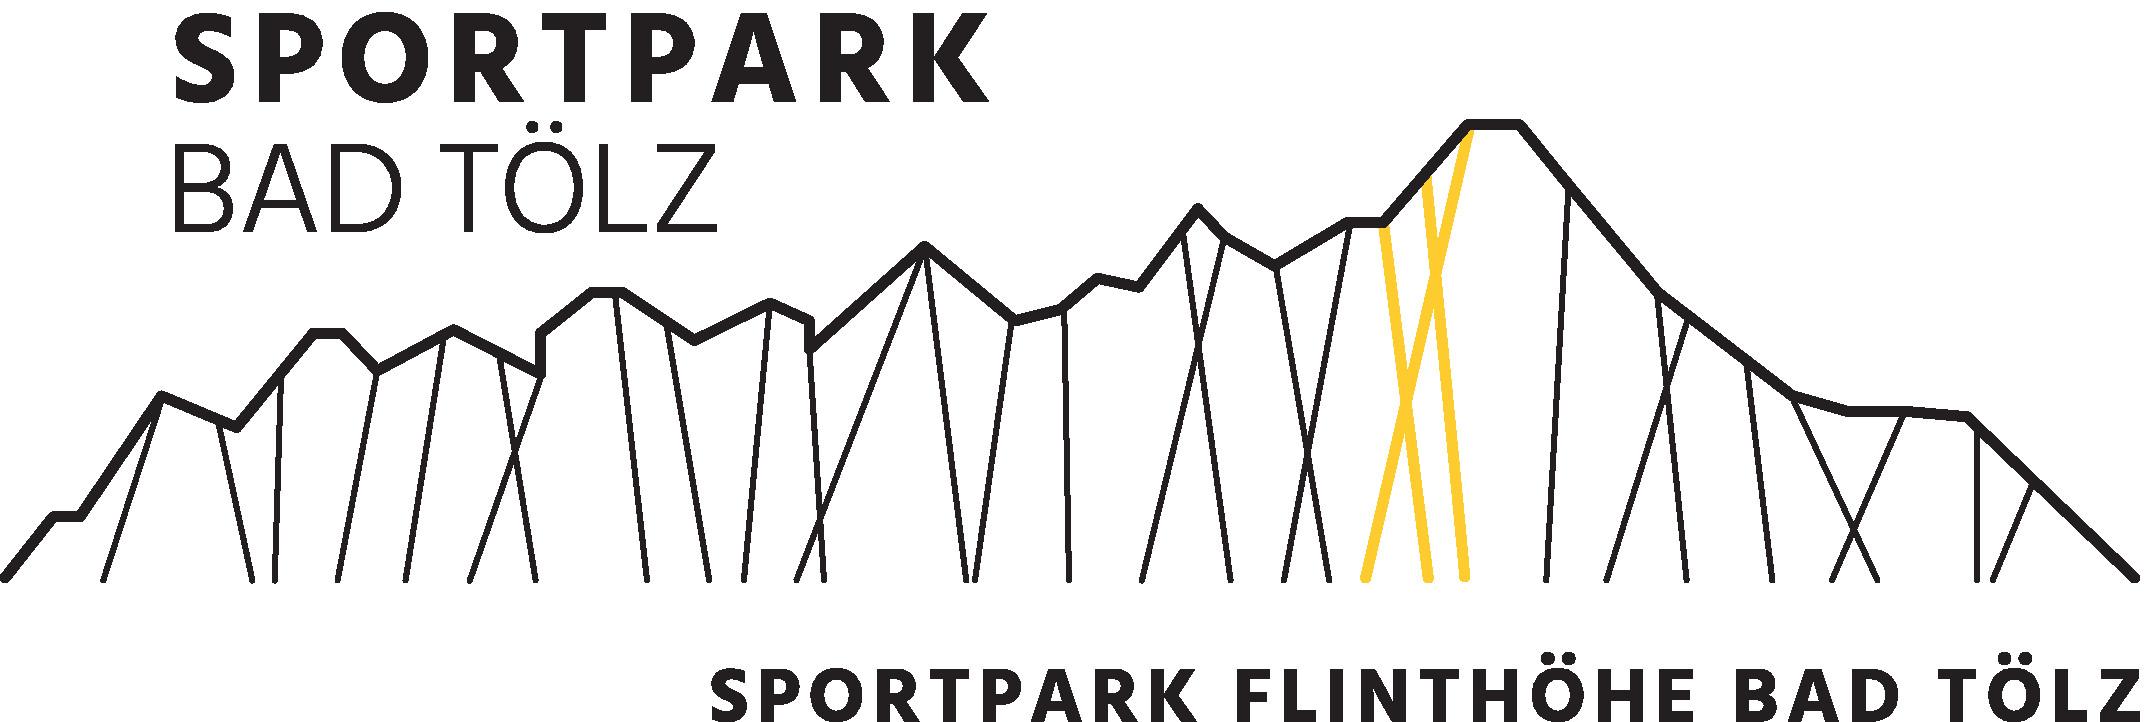 Sportpark Bad Tölz